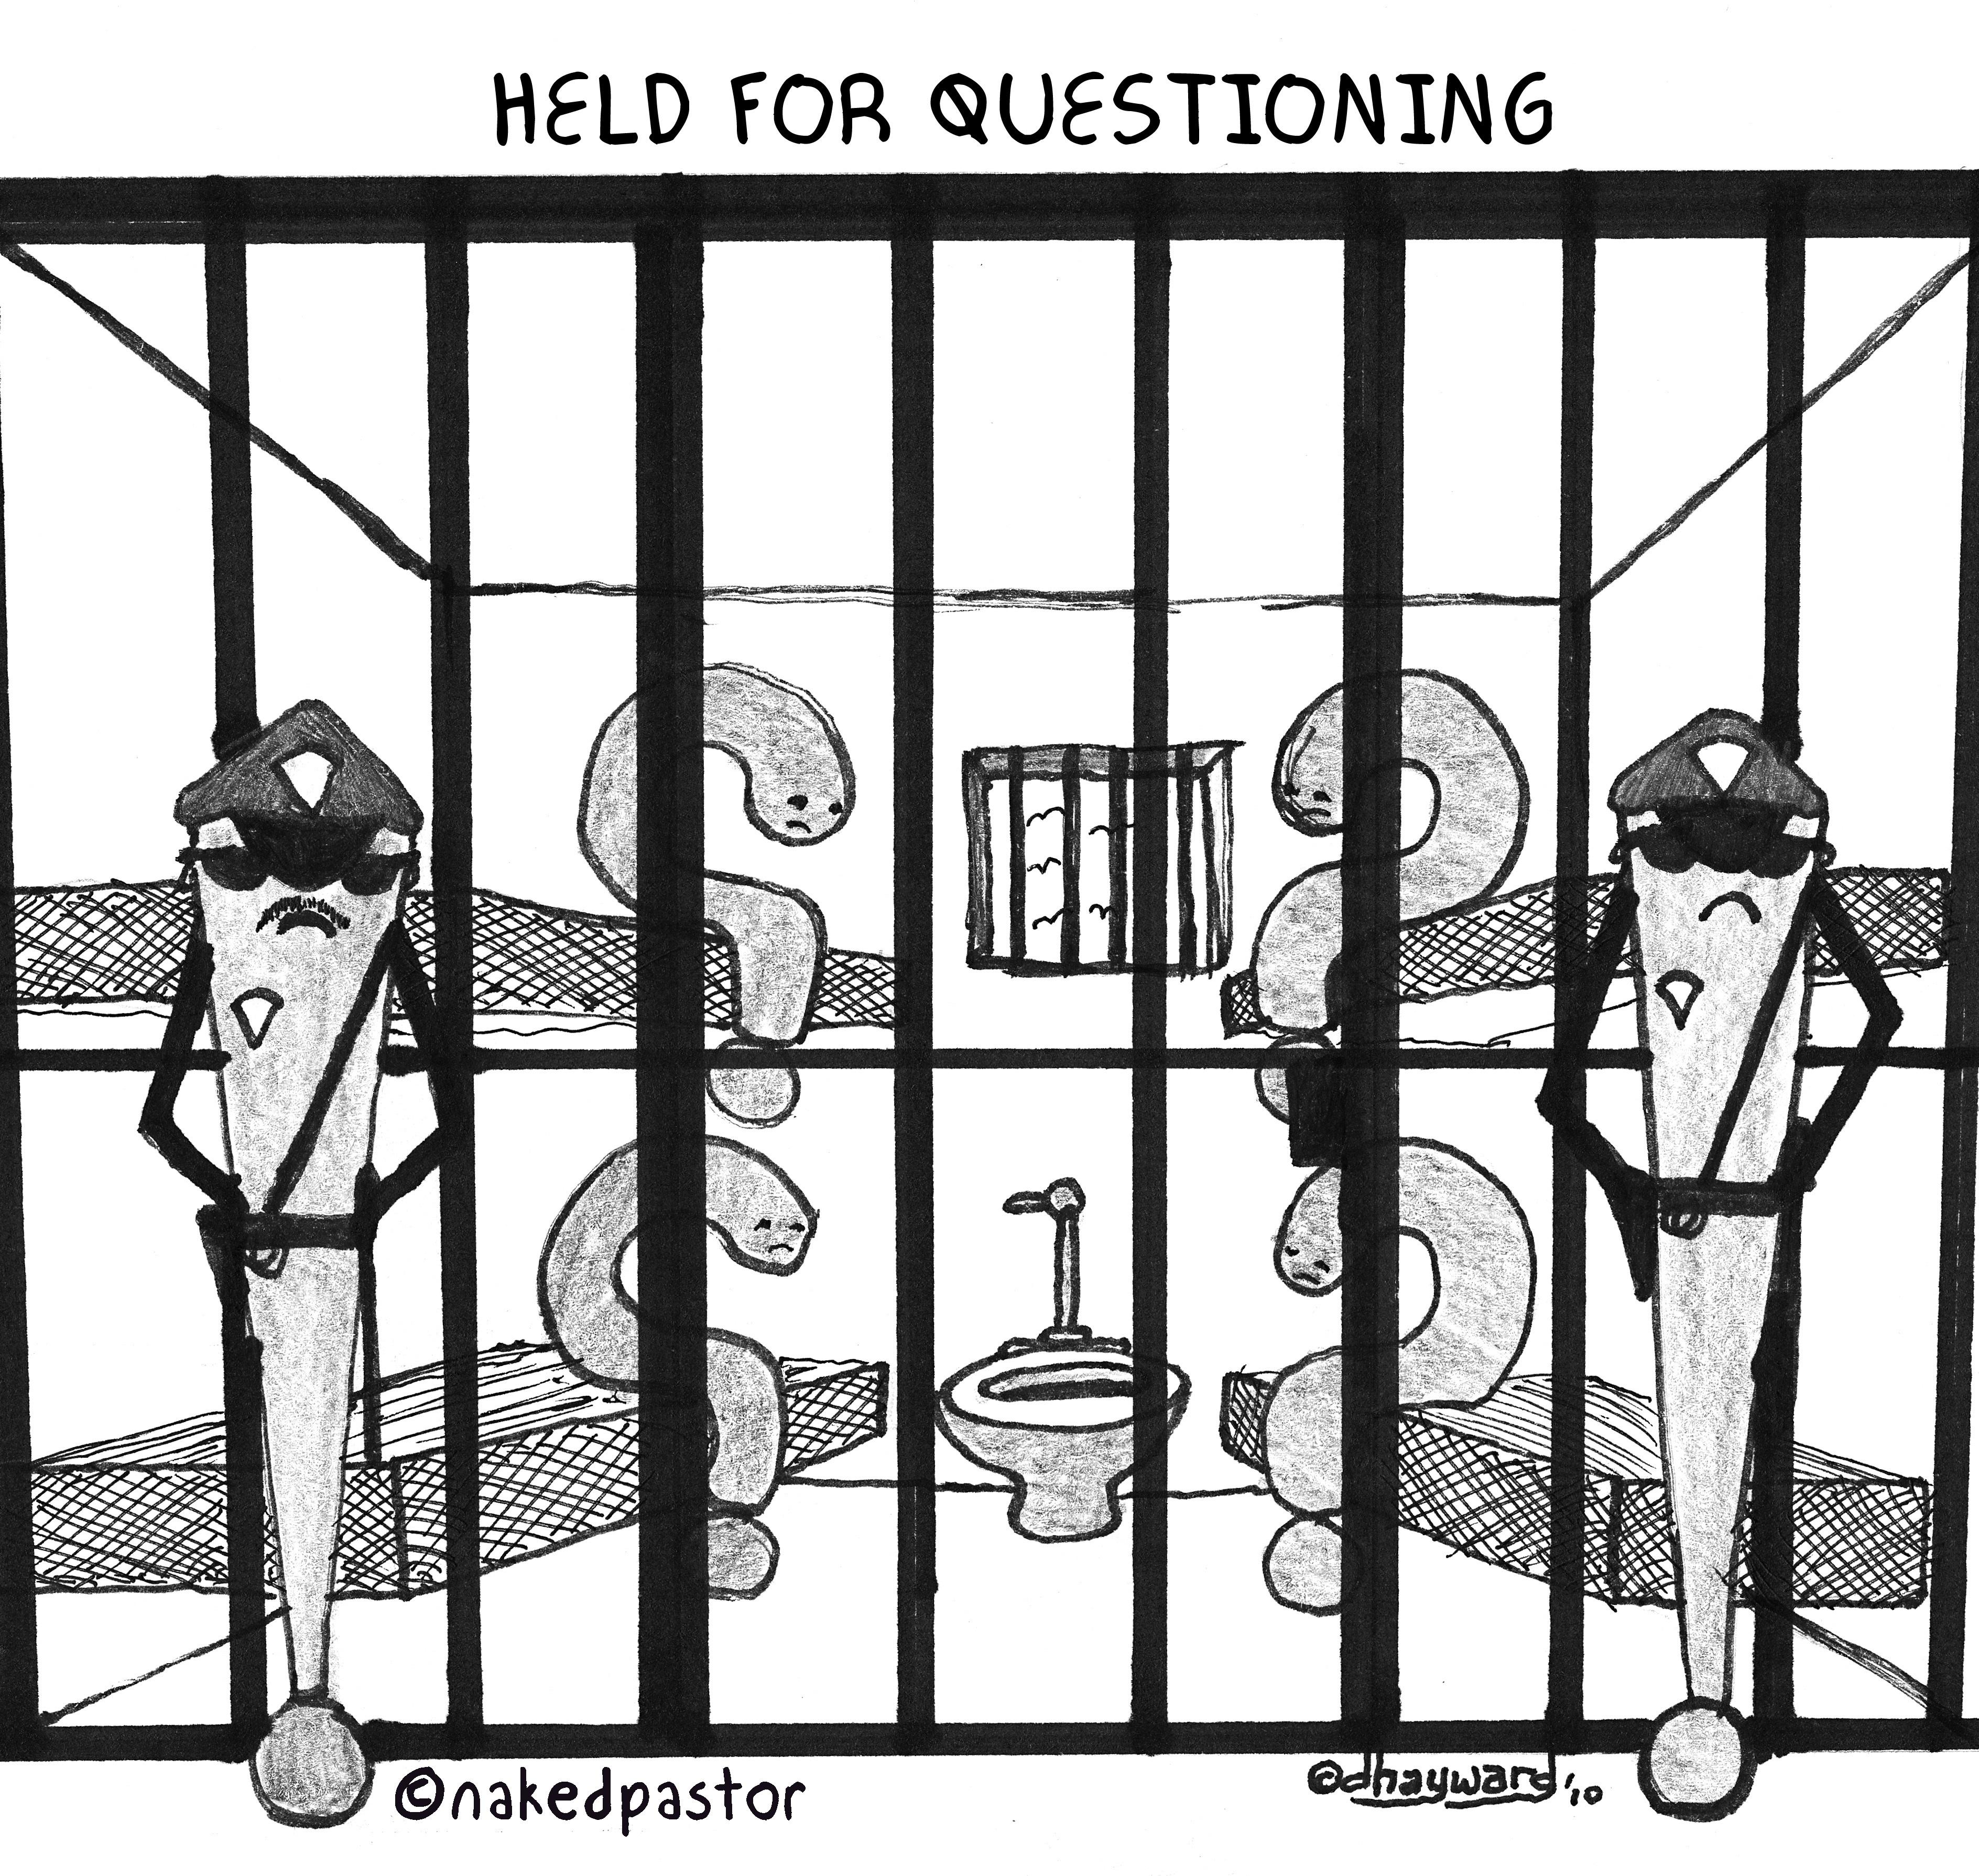 HeldForQuestioning